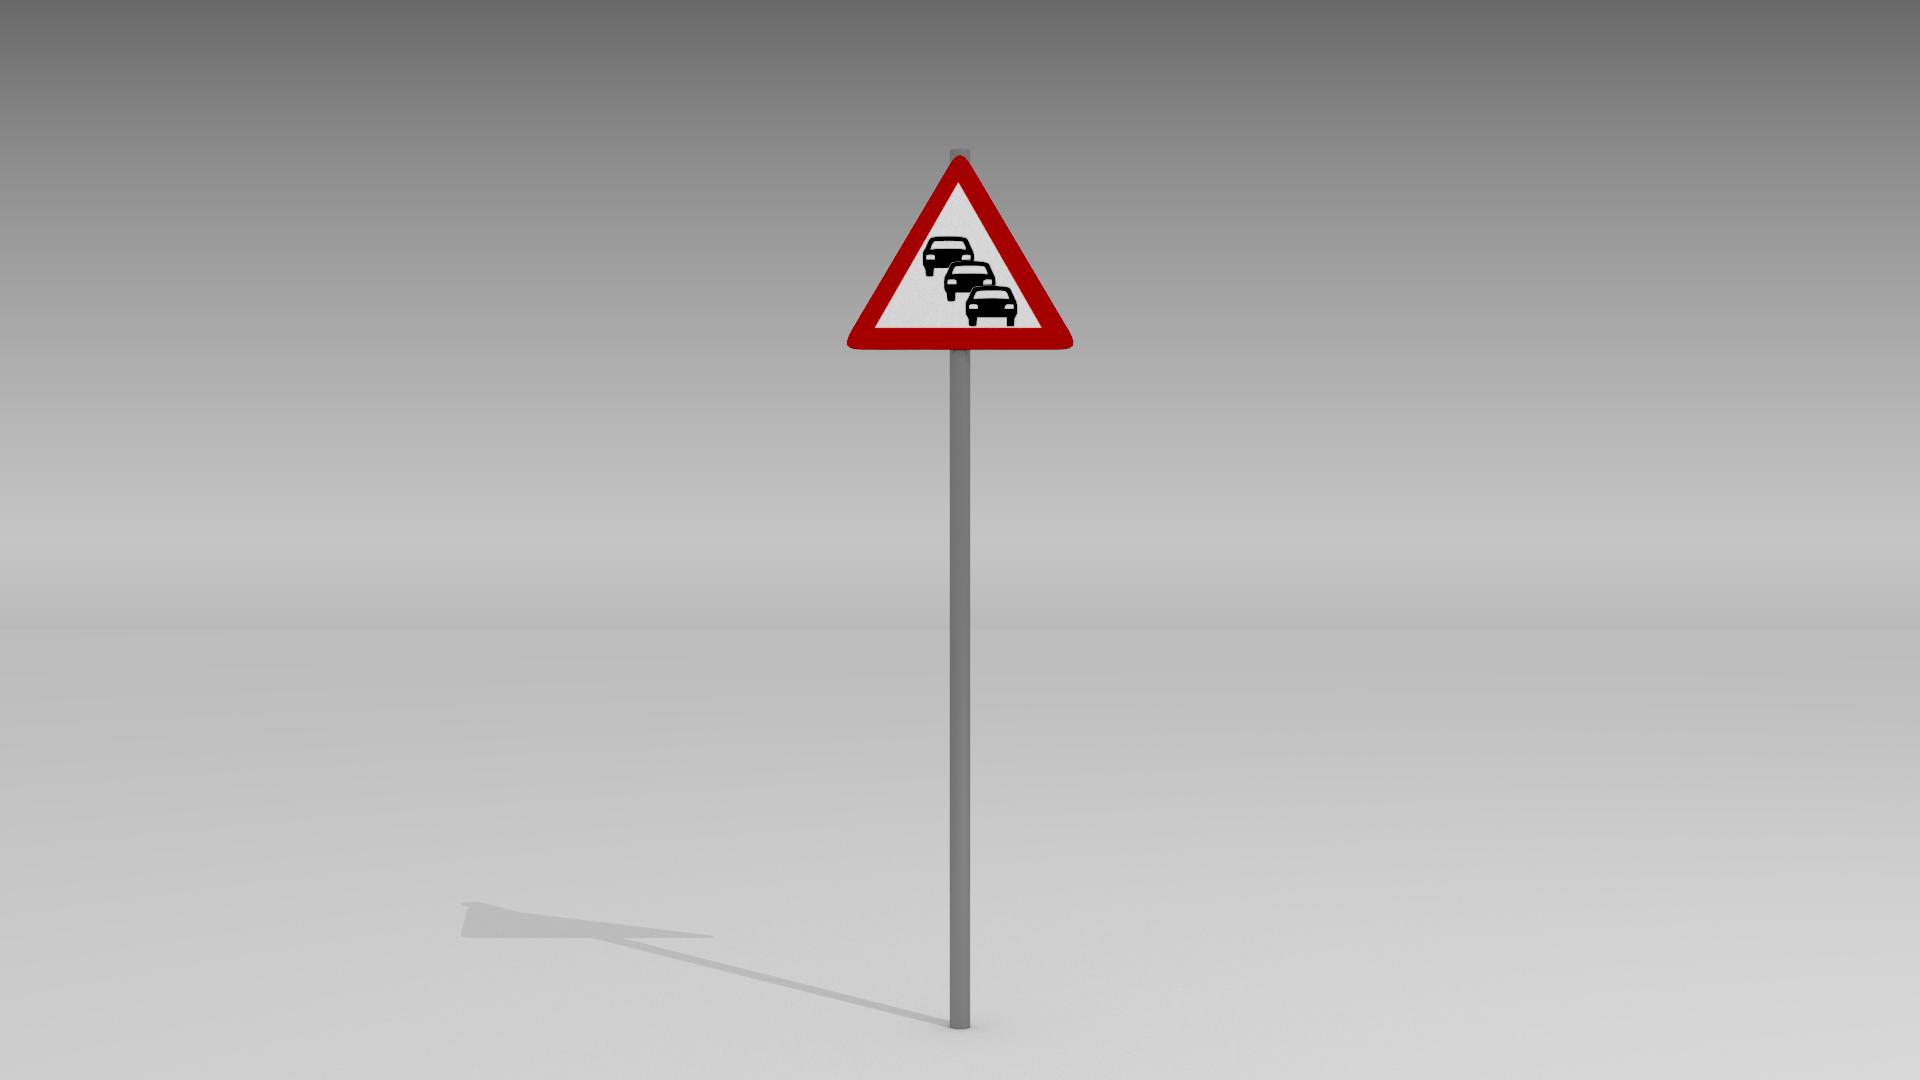 Heavy traffic sign